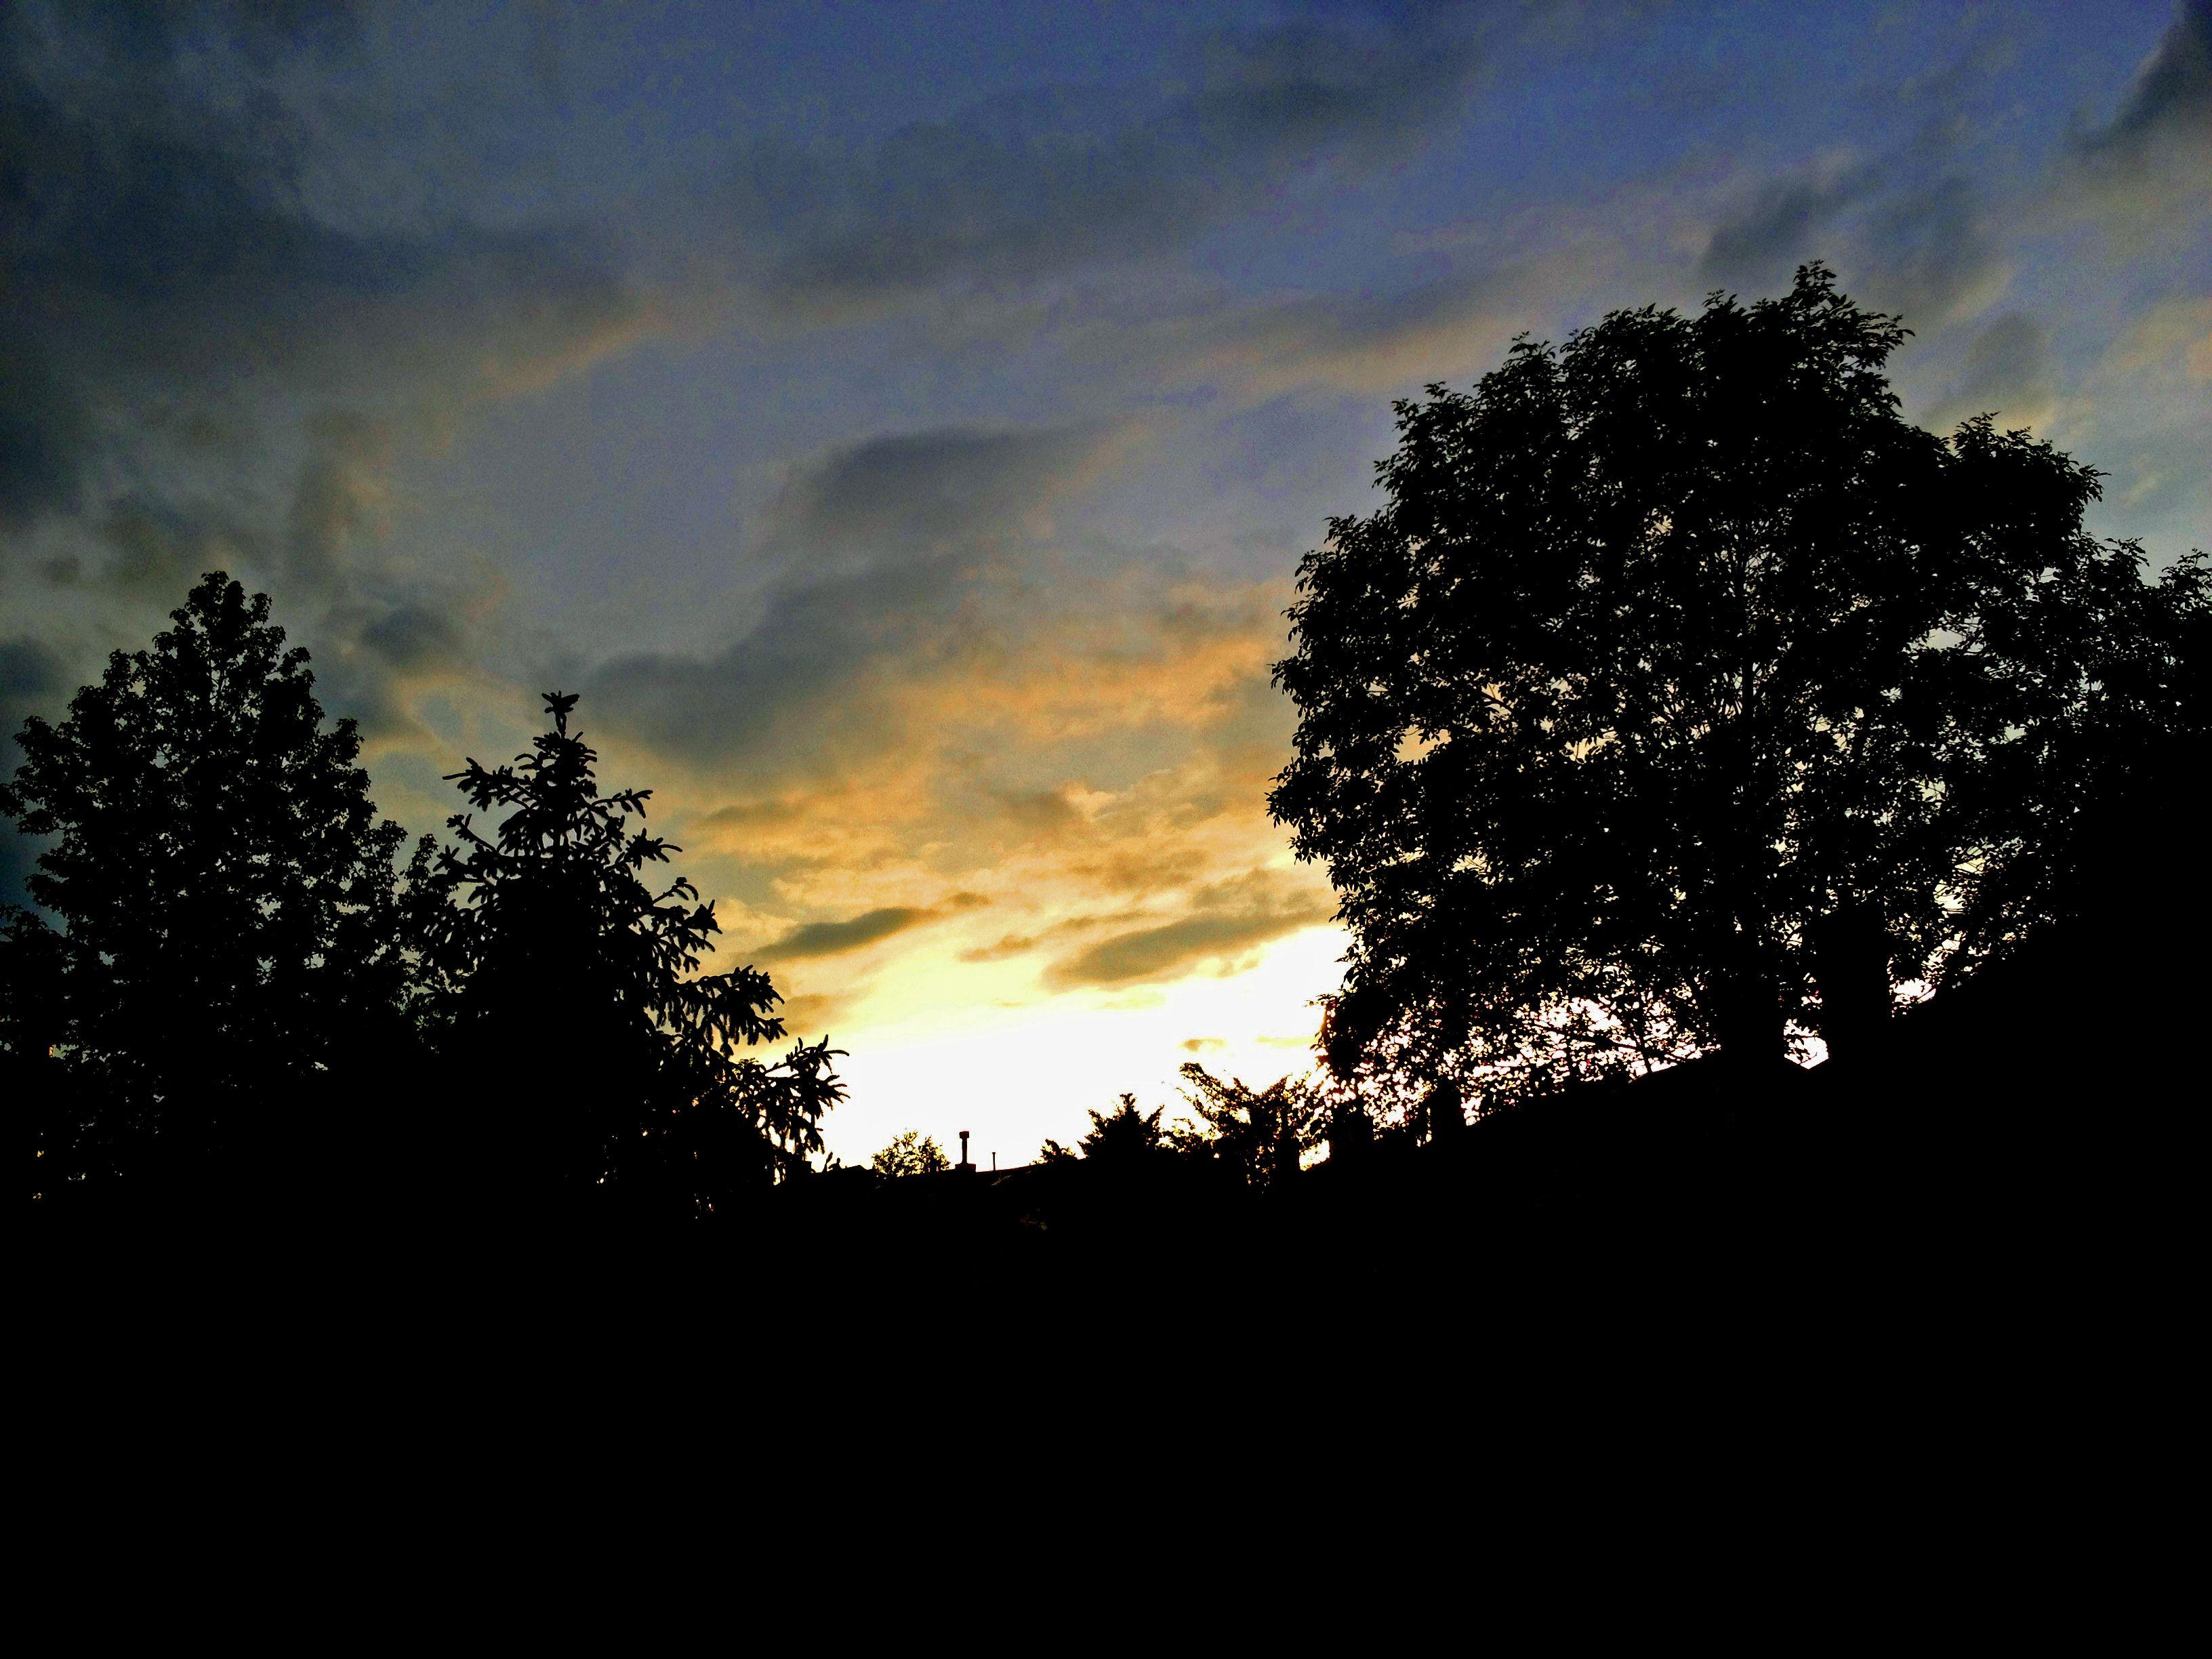 Twilight from My Backyard